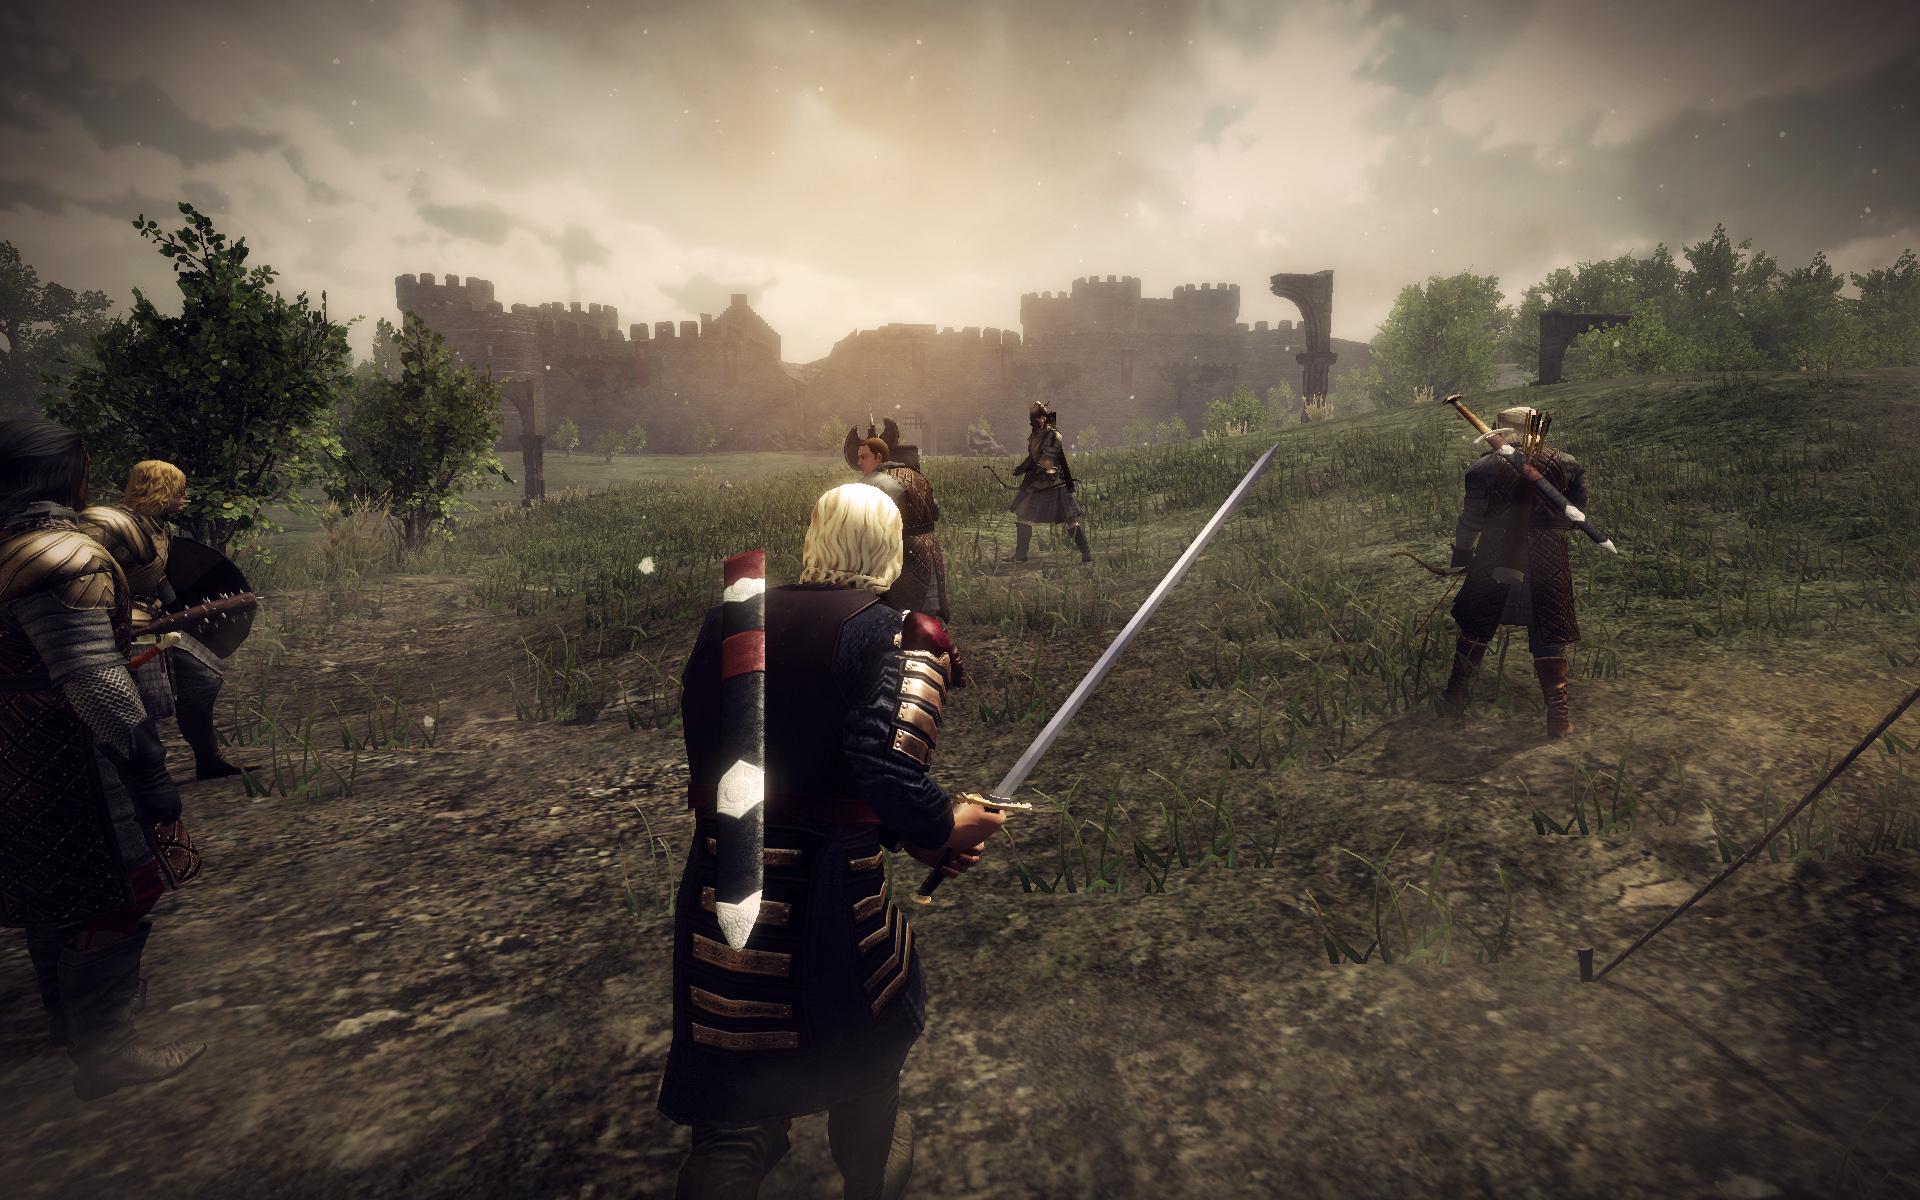 game of thrones spiel online